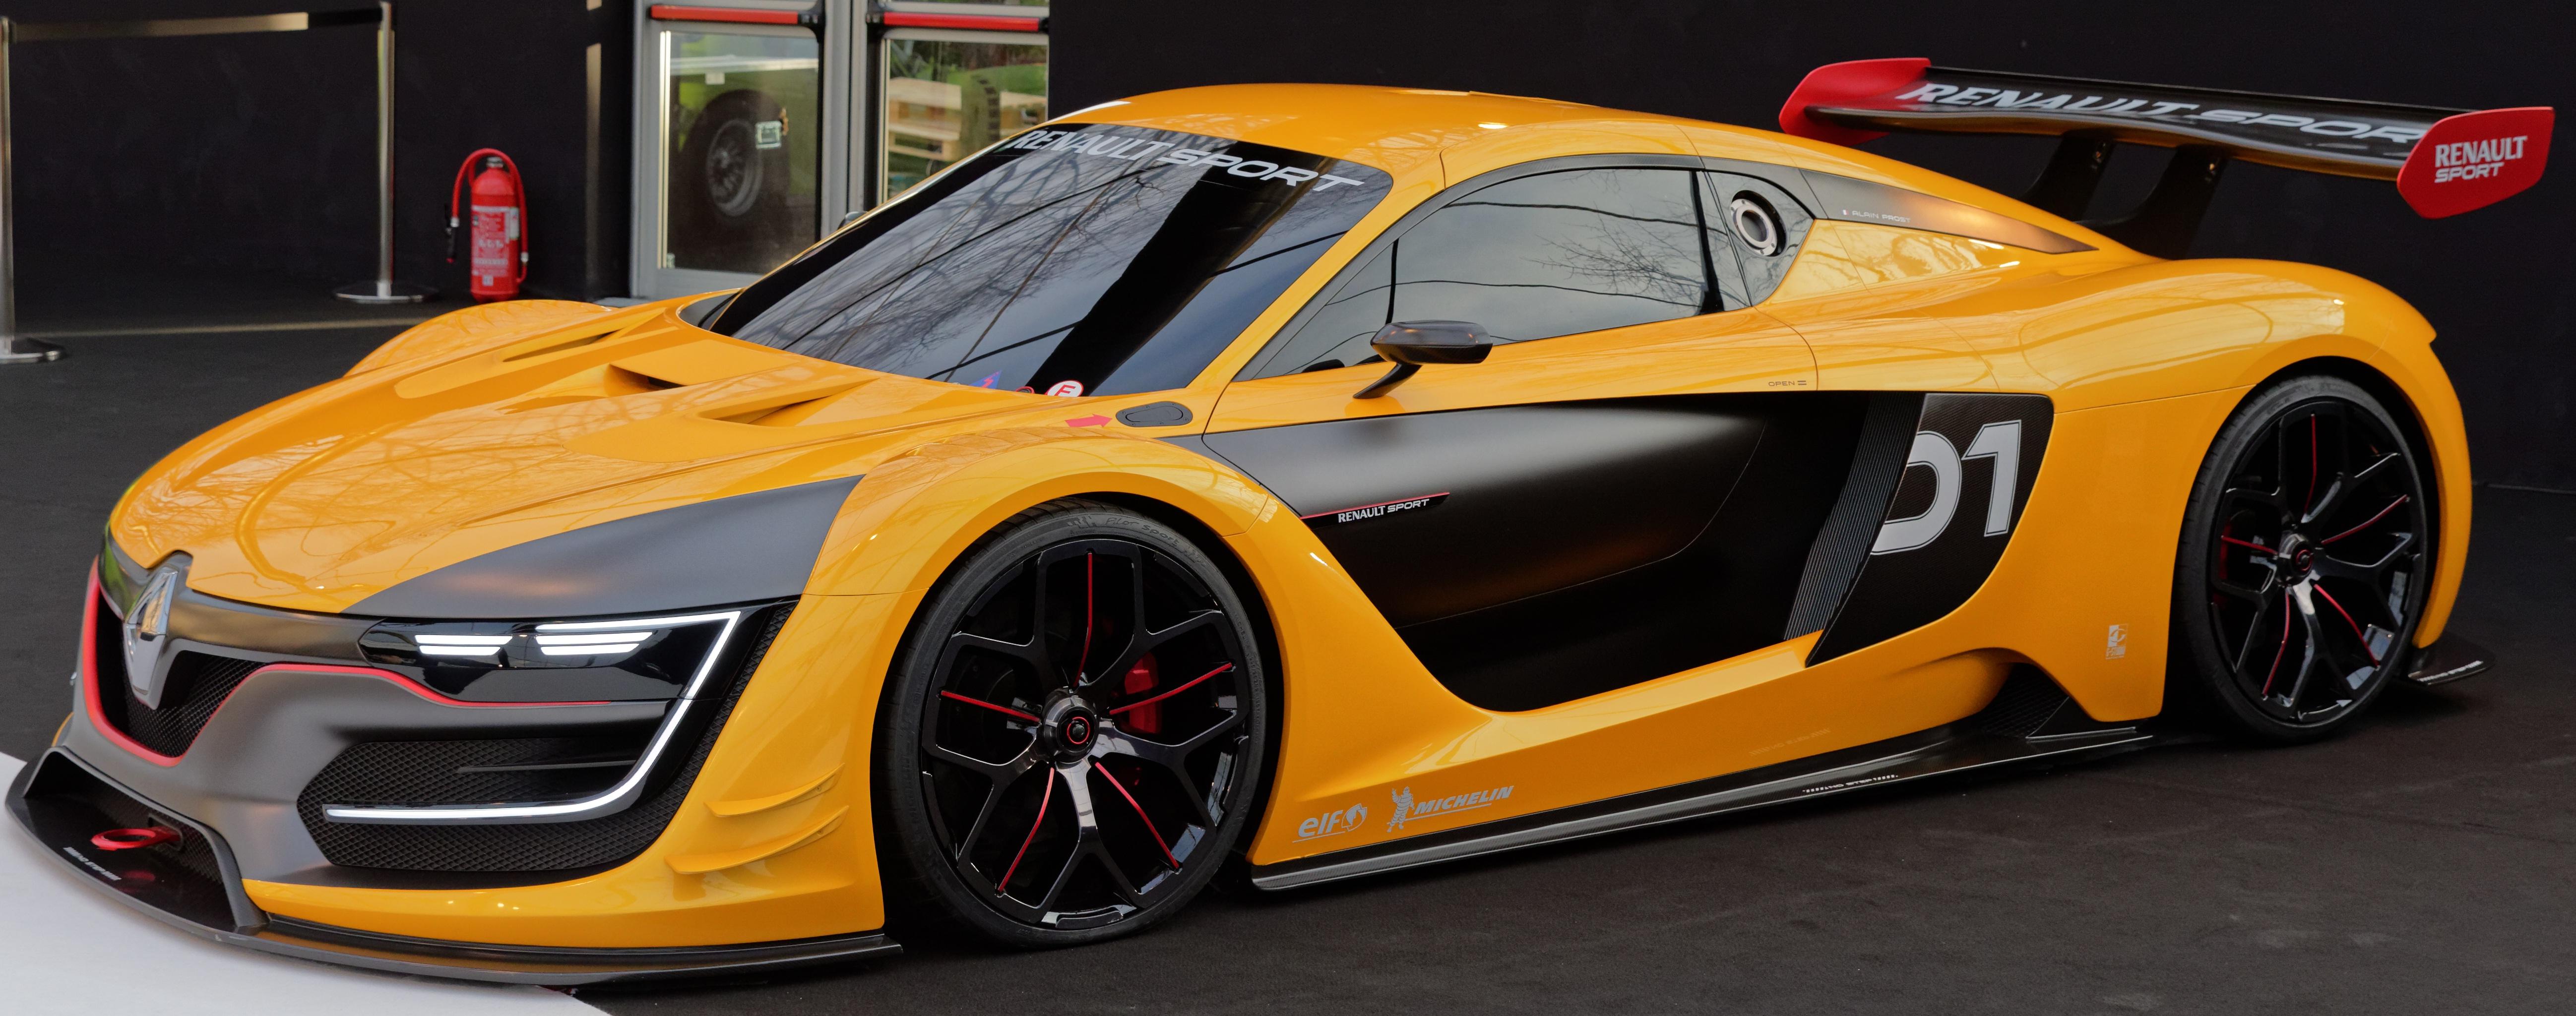 01 >> Renault Sport R S 01 Wikipedia